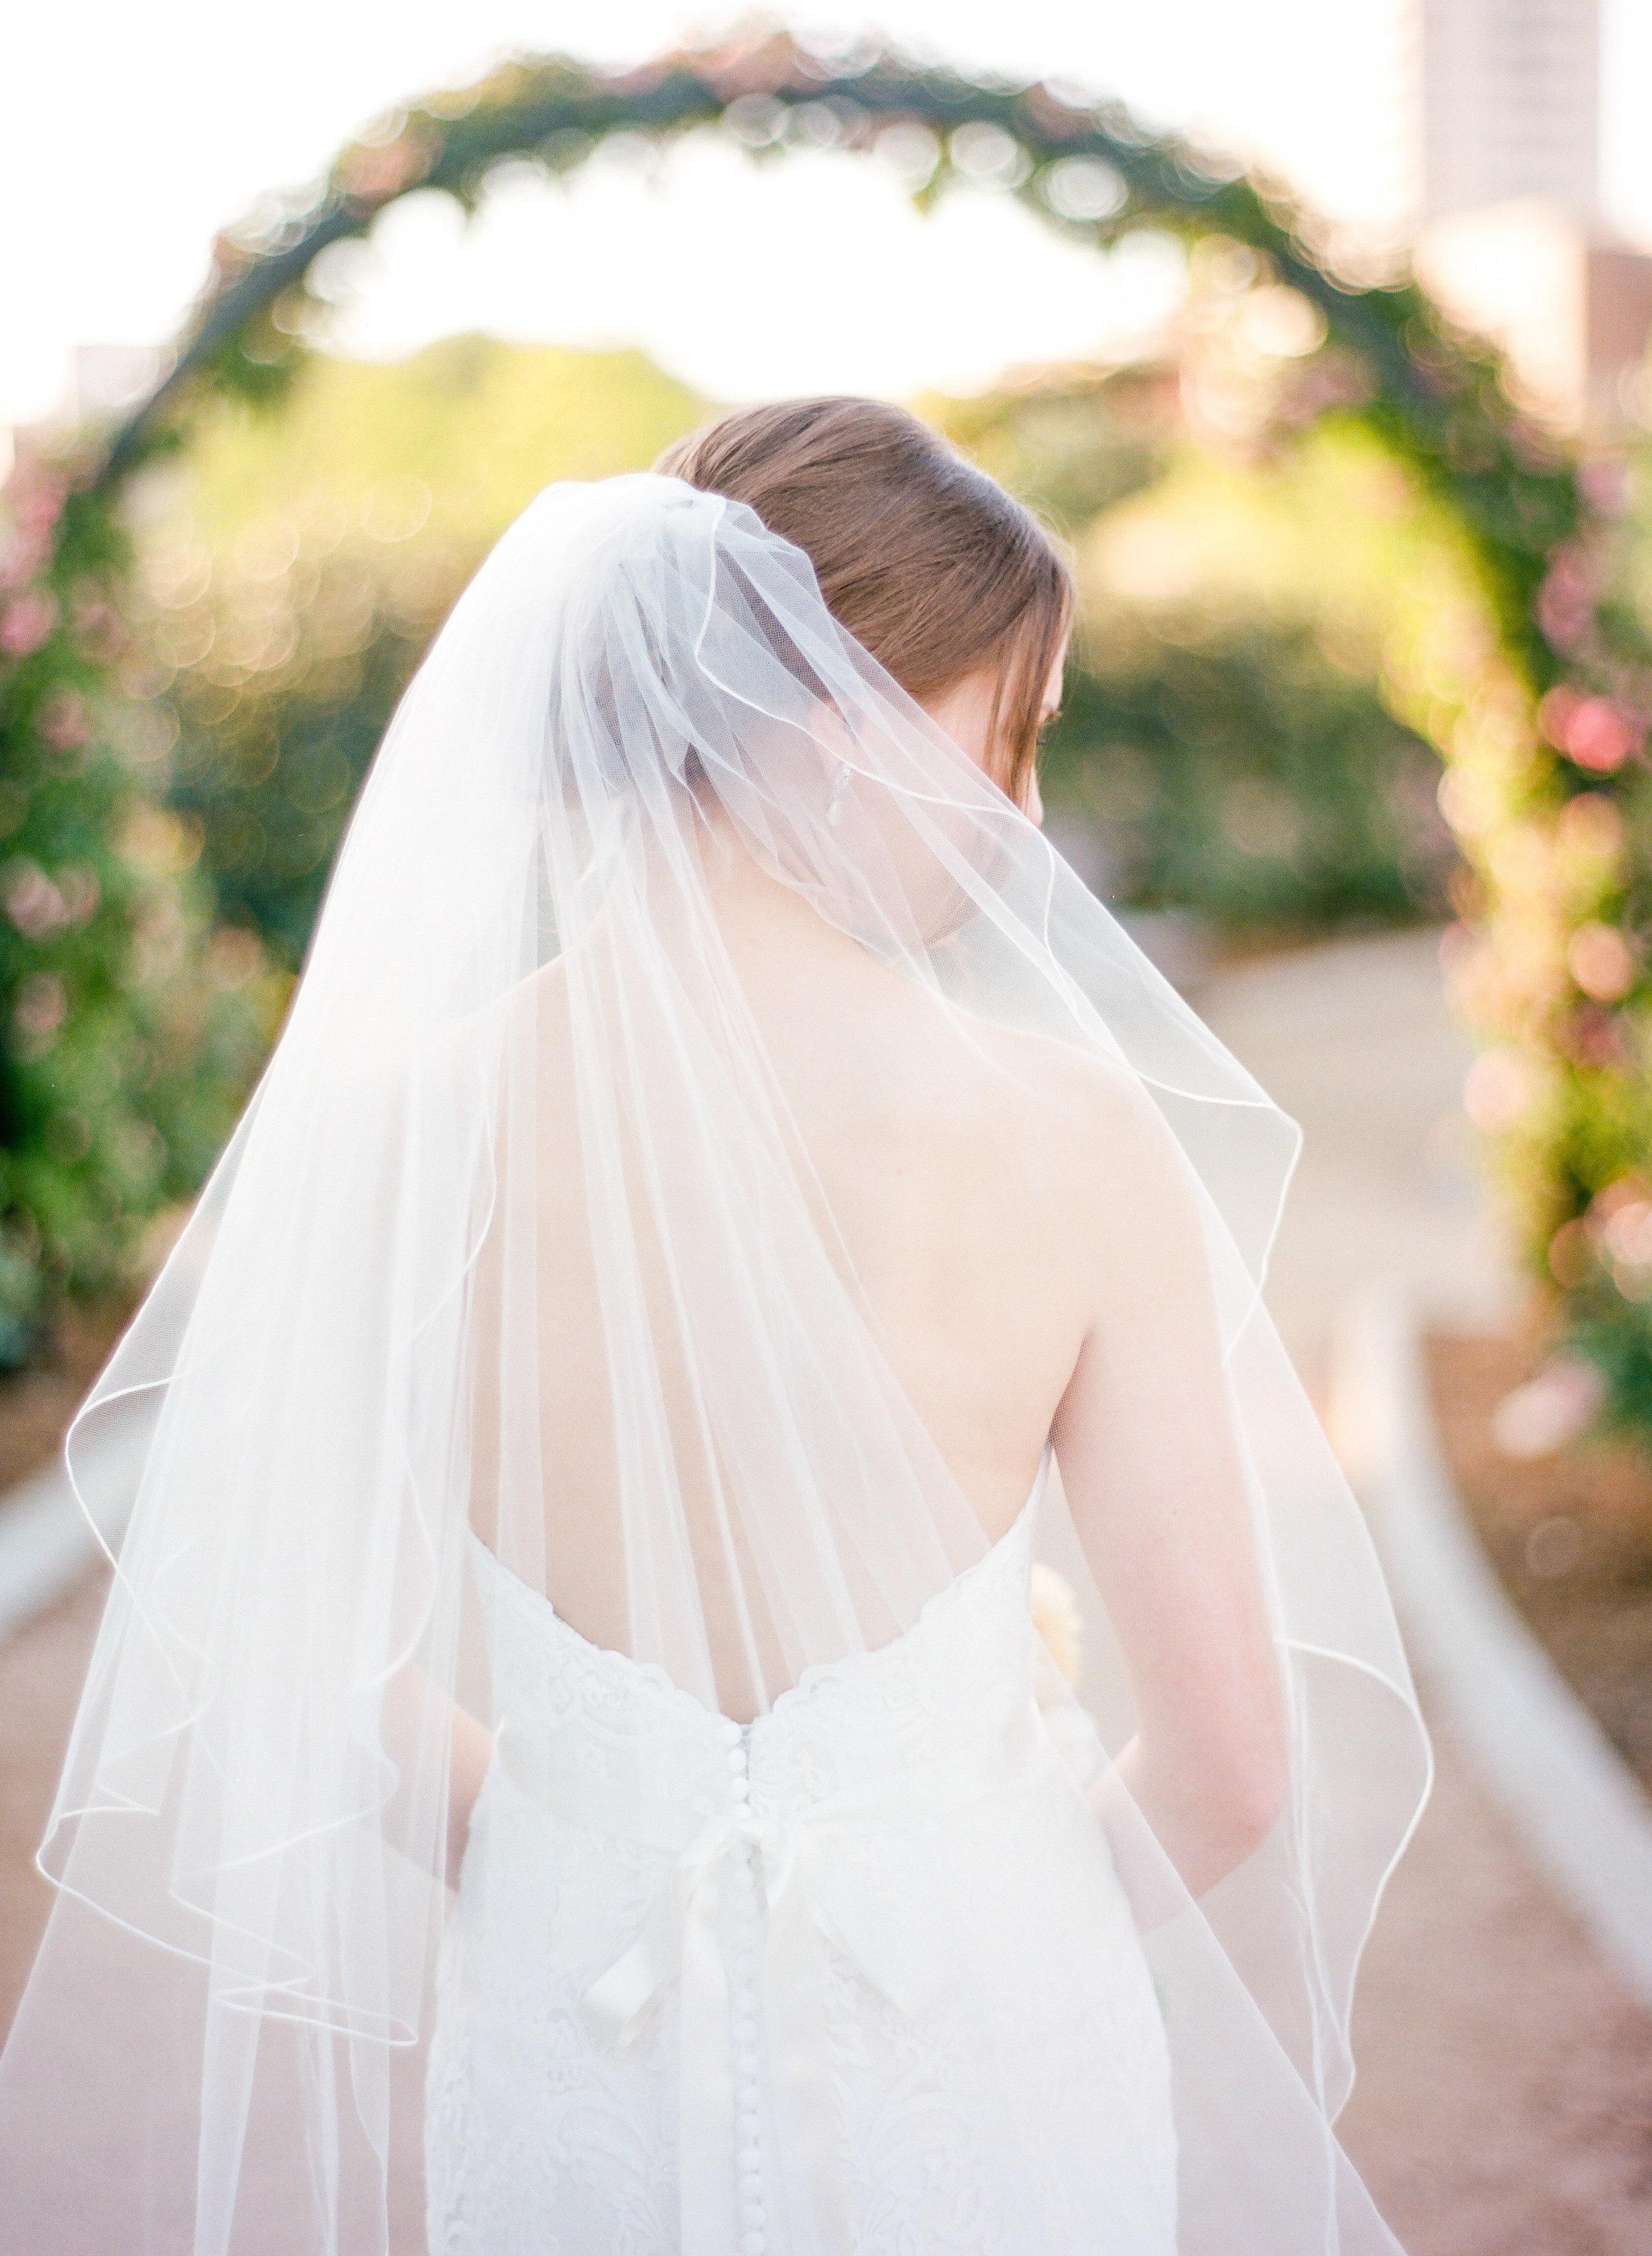 Houston-Wedding-Photographer-Film-Fine-Art-Bridals-Dana Fernandez-Photography-14.jpg